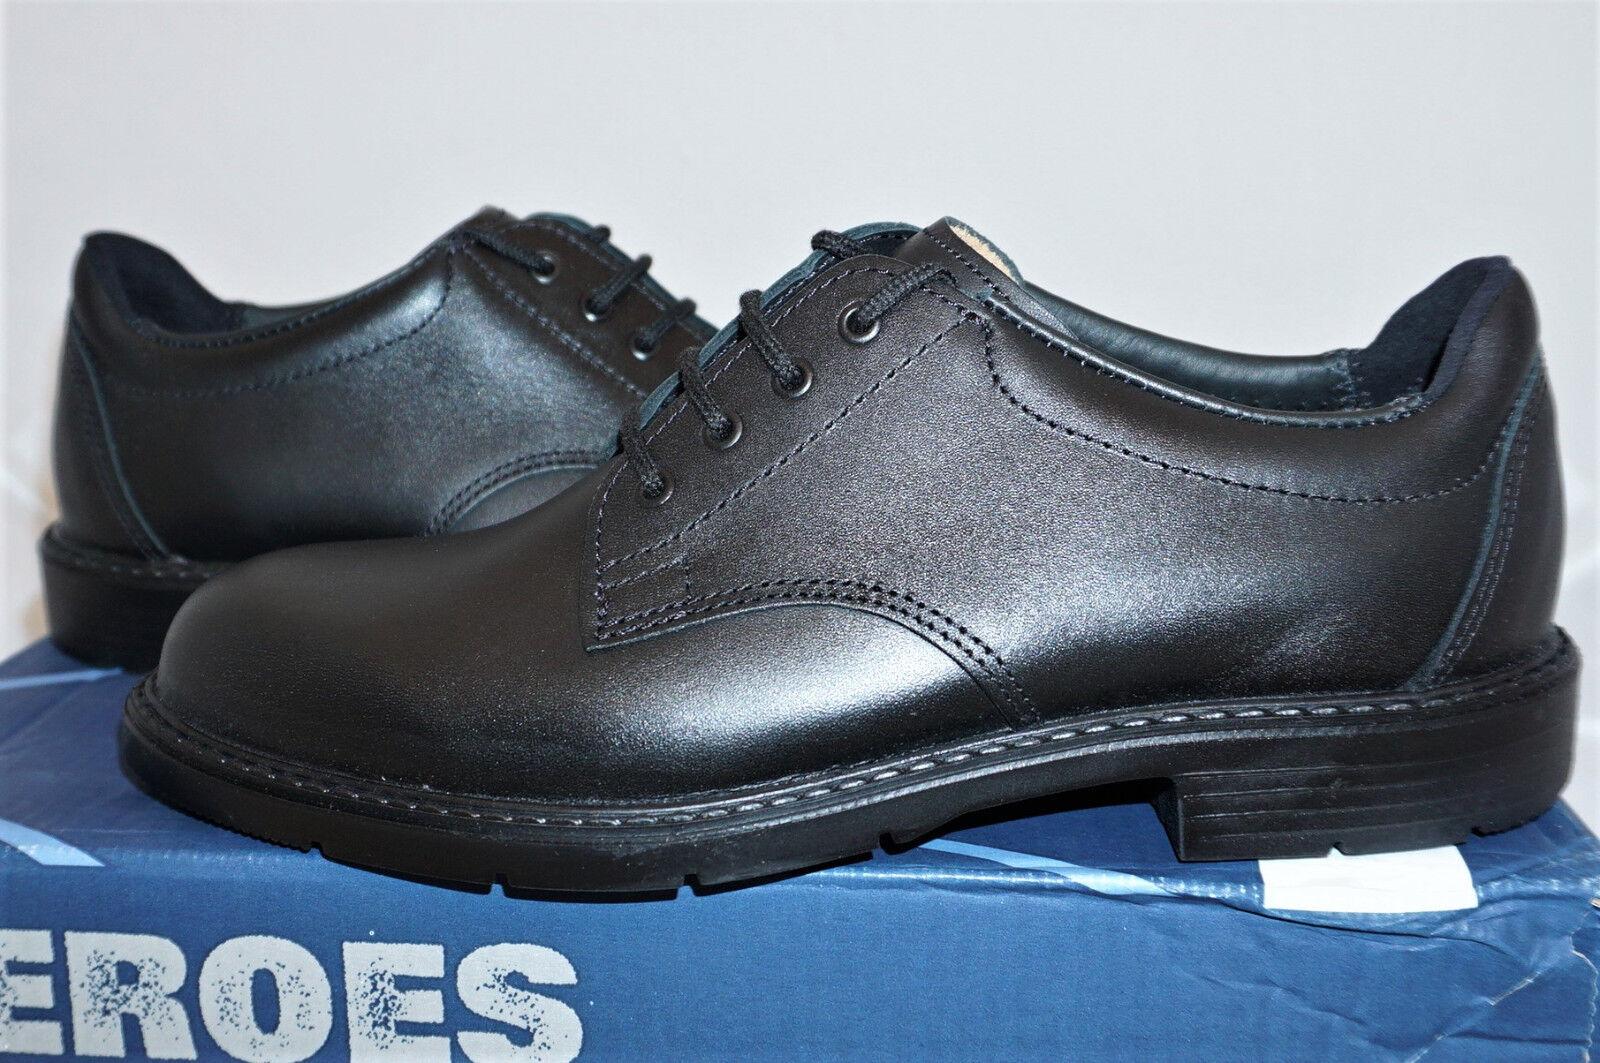 Haix Office Leder UK 7 EU 41 US 8 Polizei Leder Schuhe Büro NEU